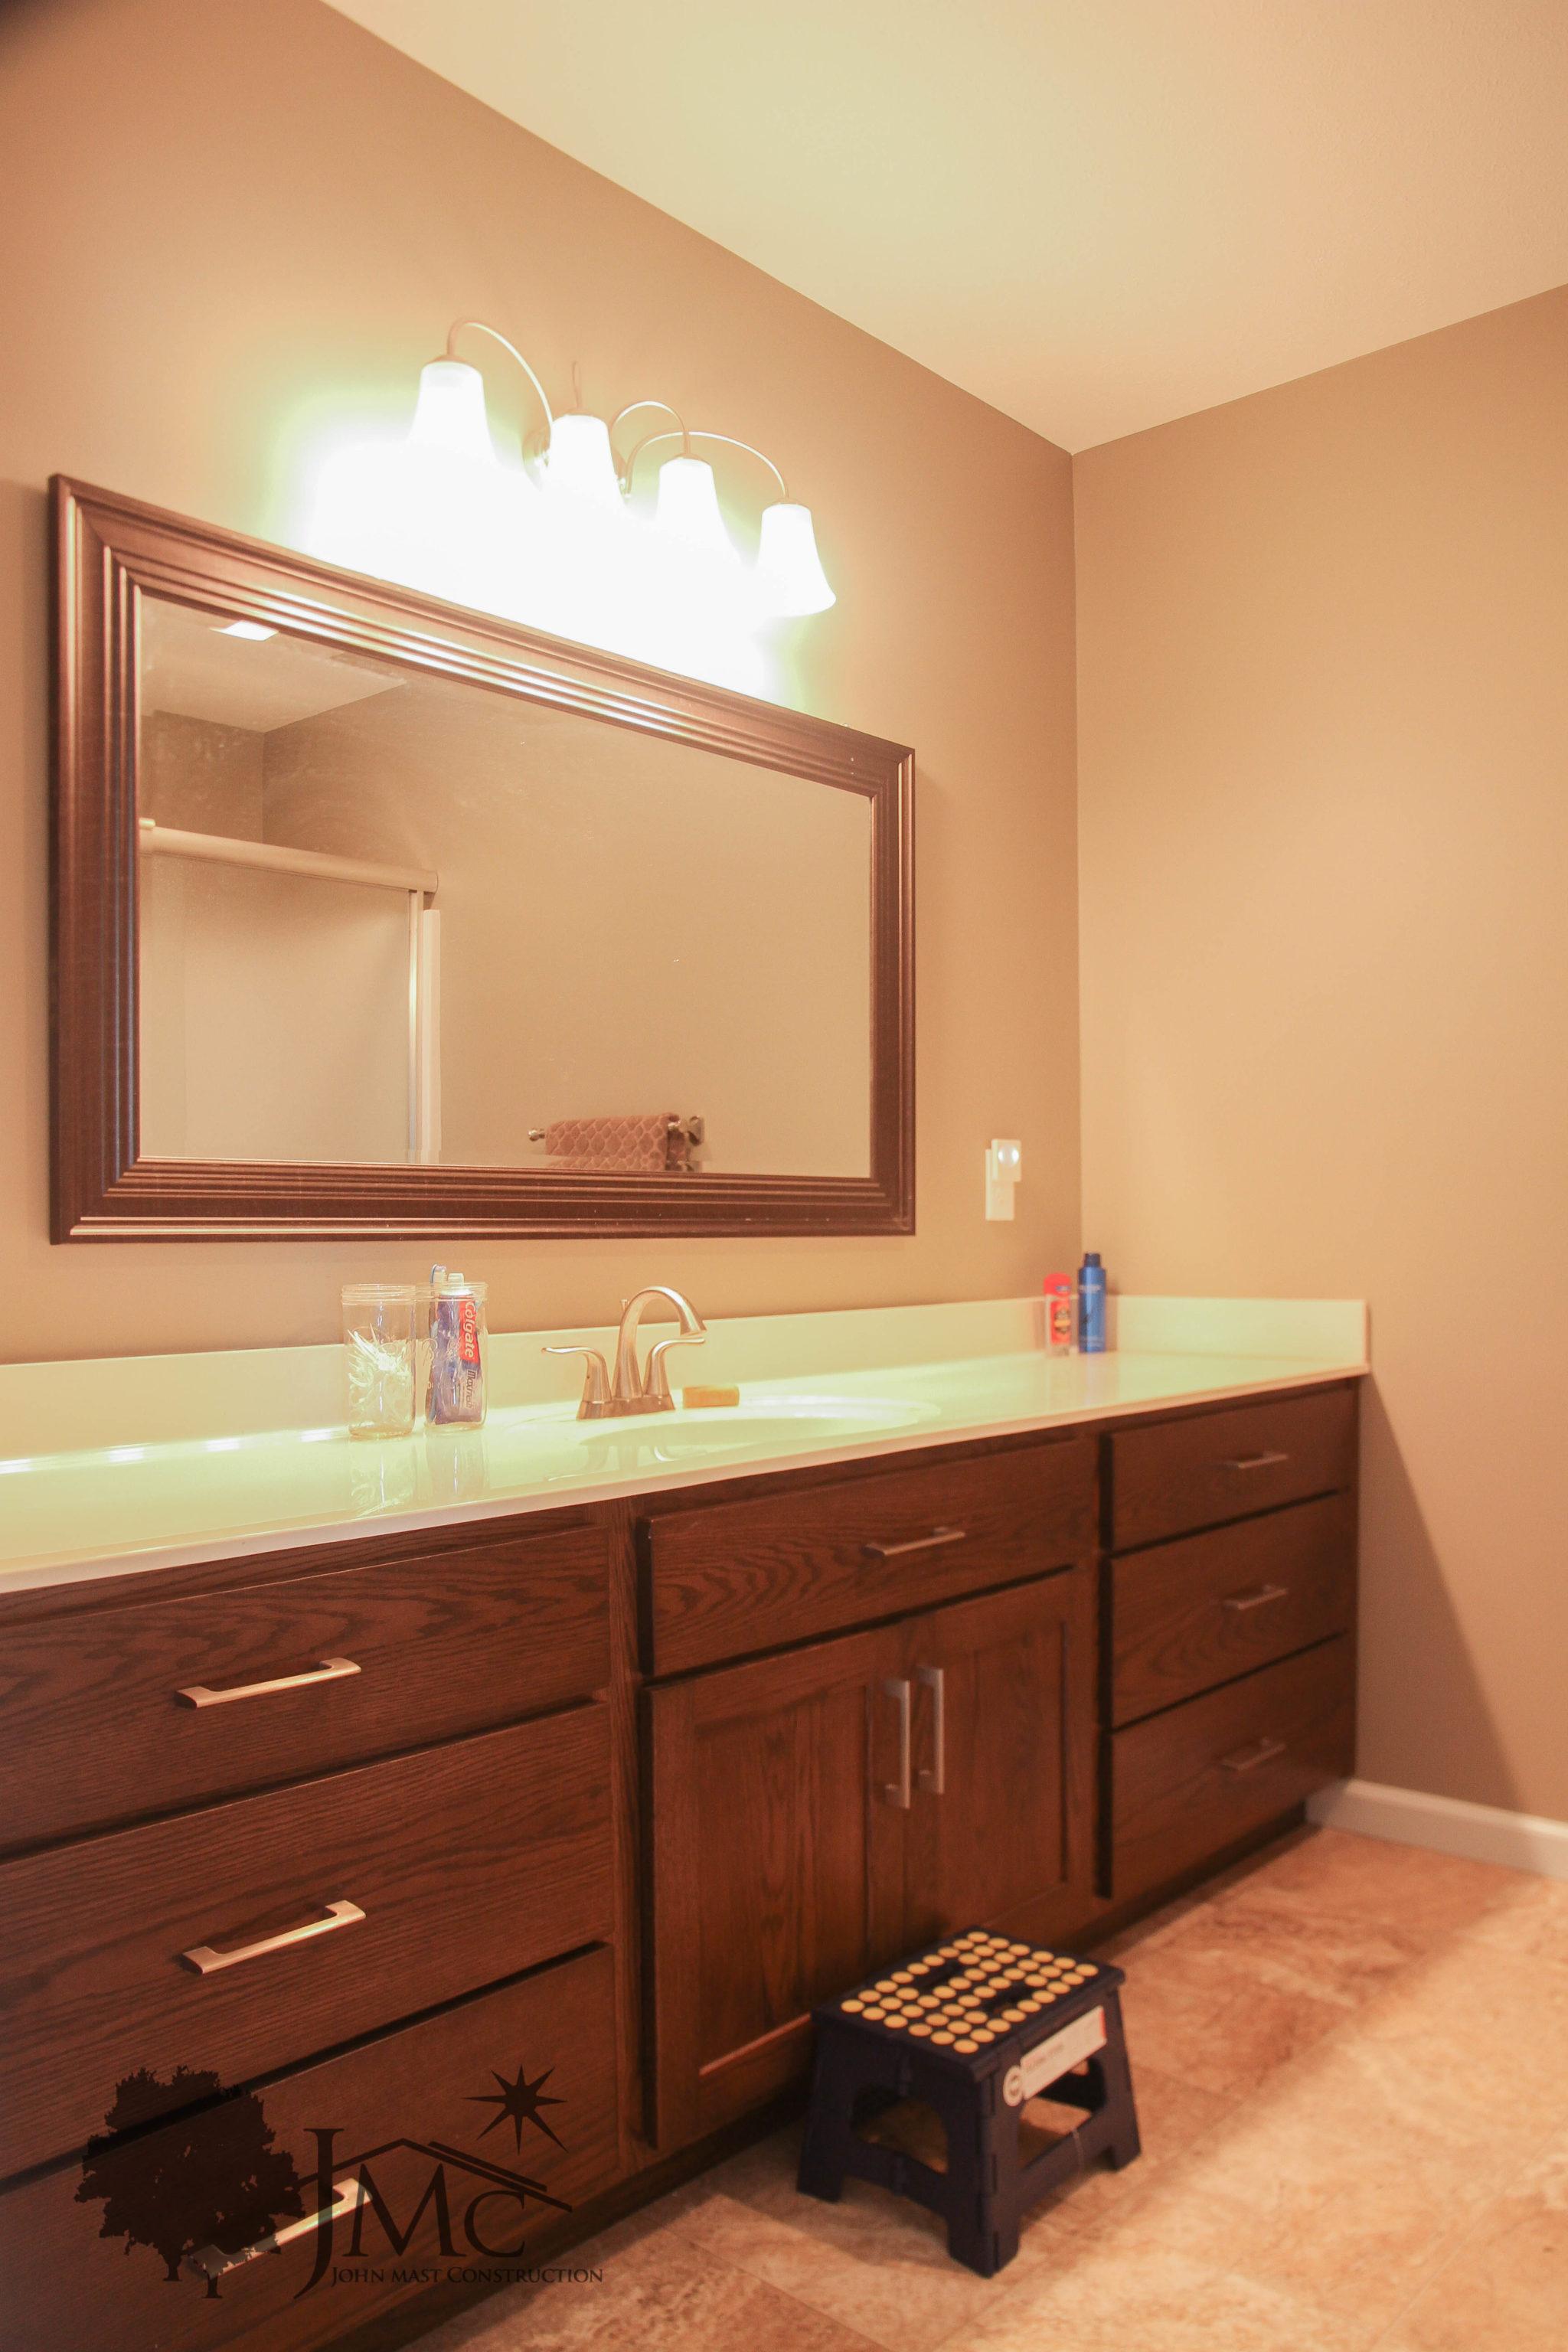 Large Bathroom Counter With Sink In Mishawaka, Indiana